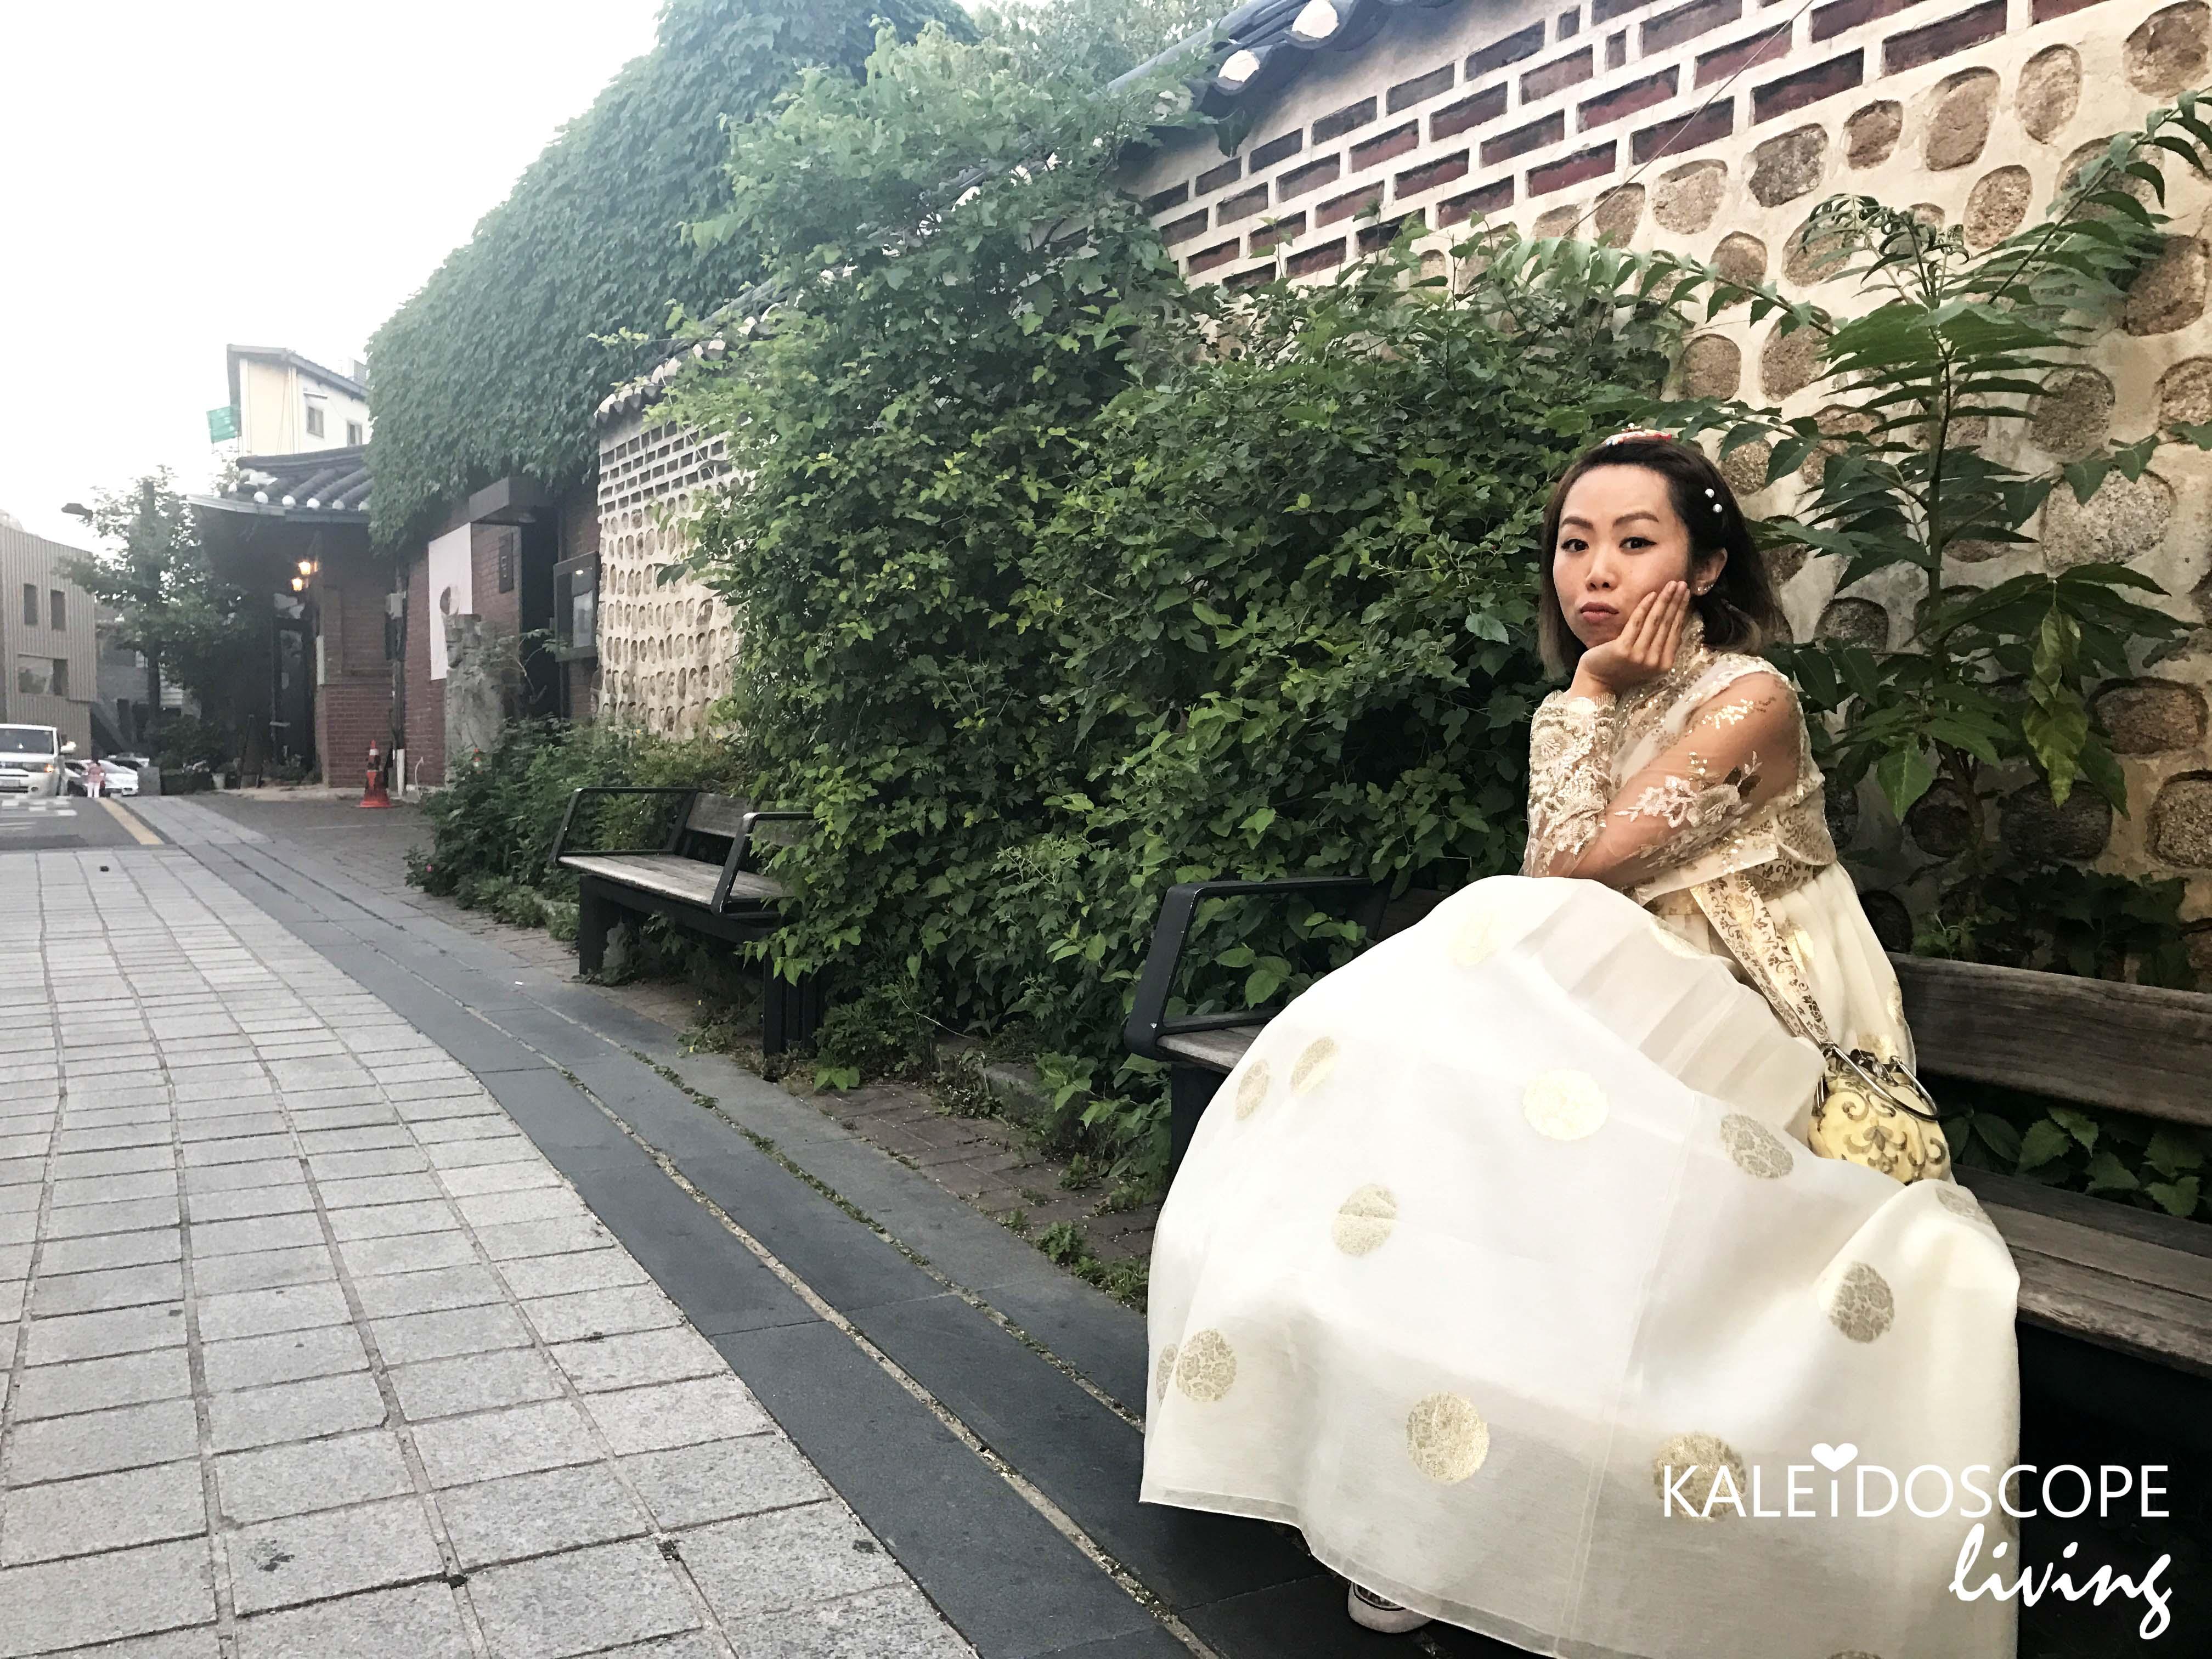 Travel_Korea_Seoul_Insadong_Habok_韓國_首爾_韓服_Anguk